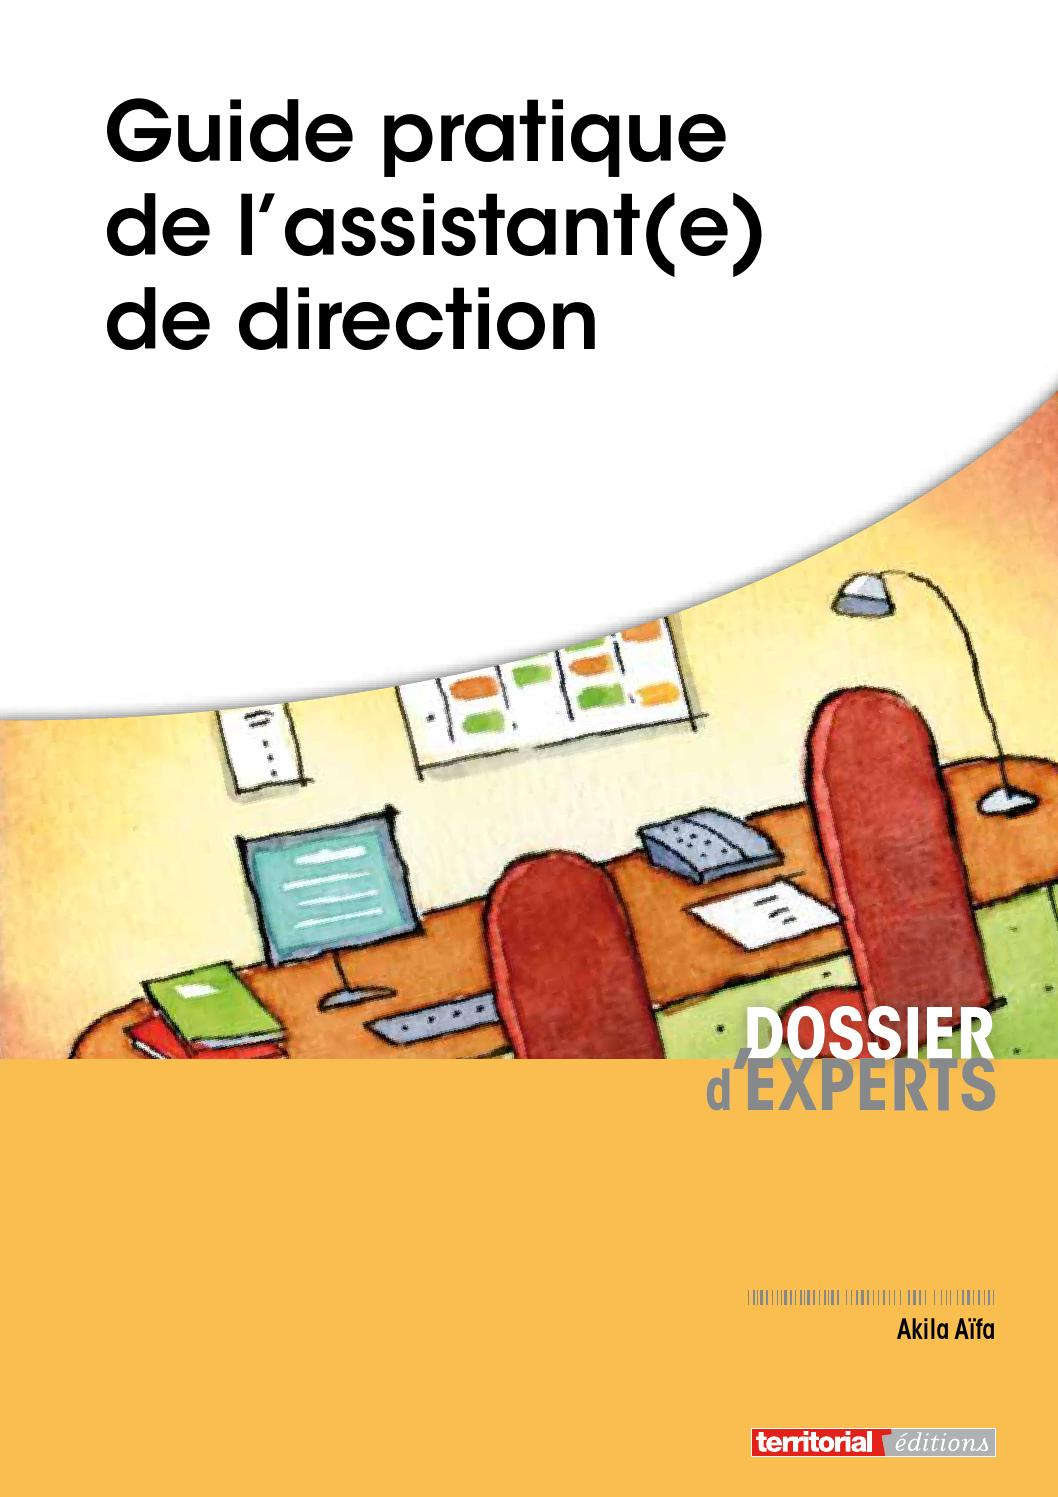 guide pratique de l 39 assistant e de direction by infopro digital issuu. Black Bedroom Furniture Sets. Home Design Ideas